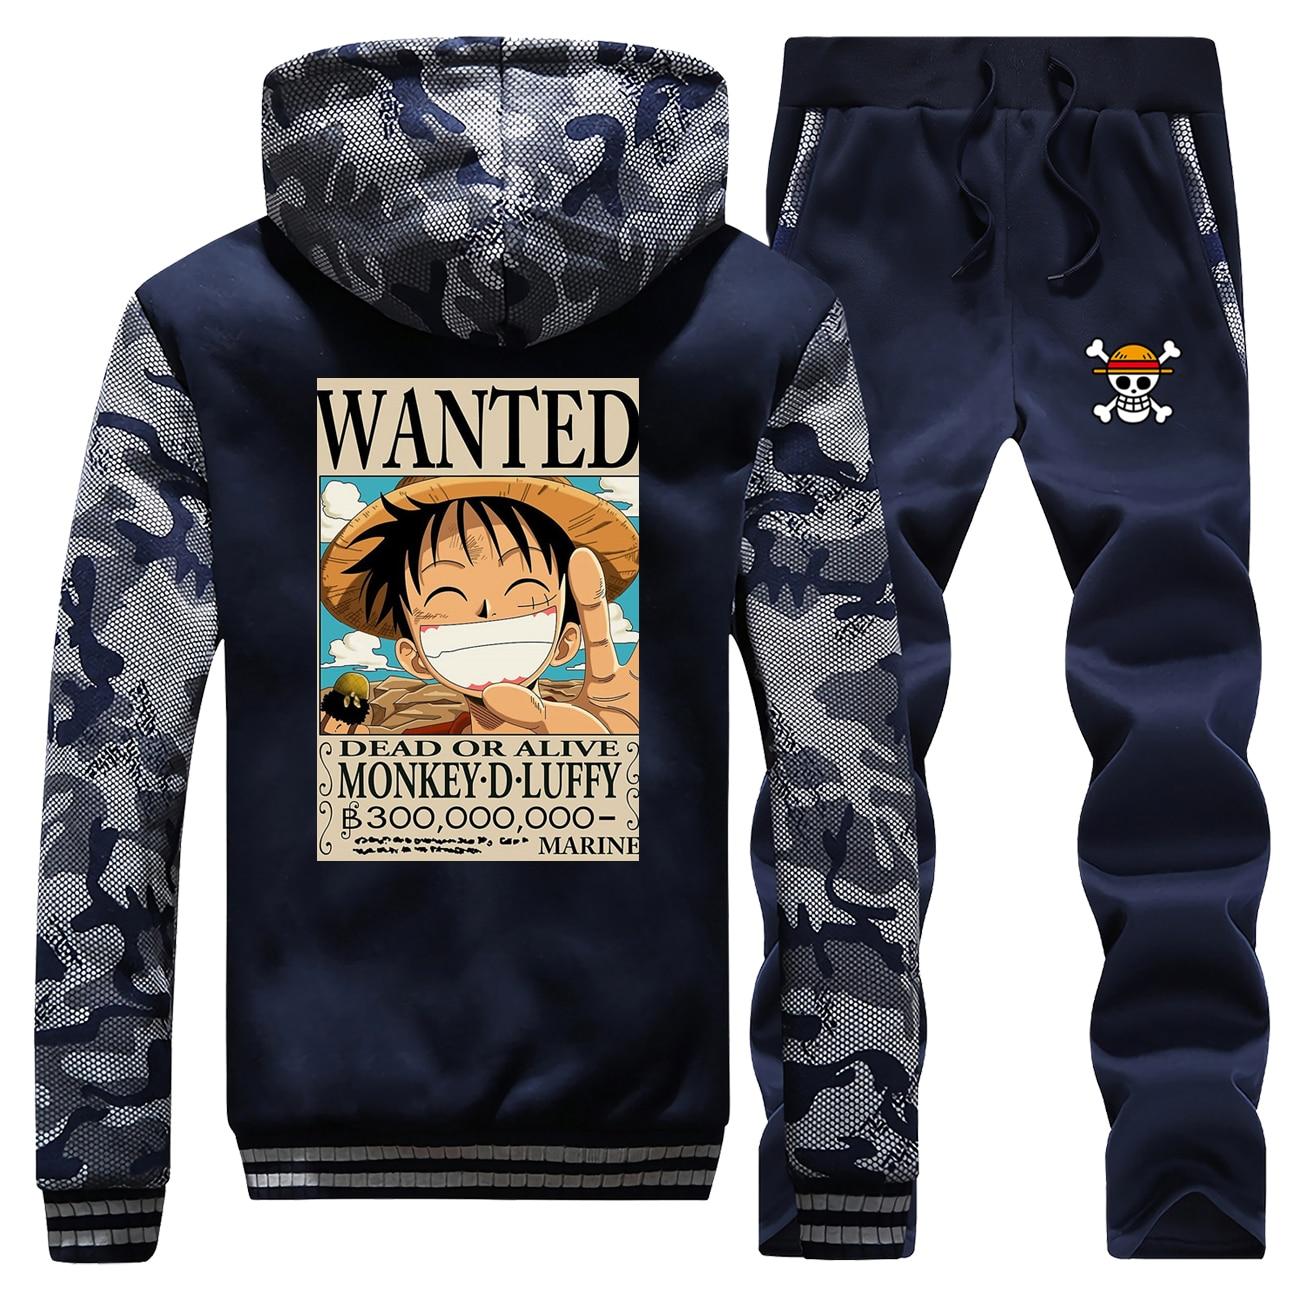 Japan Anime Men's Sets One Piece Fashion Warm Tracksuit Monkey D Luffy Wanted Camo Jacket Winter Fashion Fleece Zipper Sweatsuit